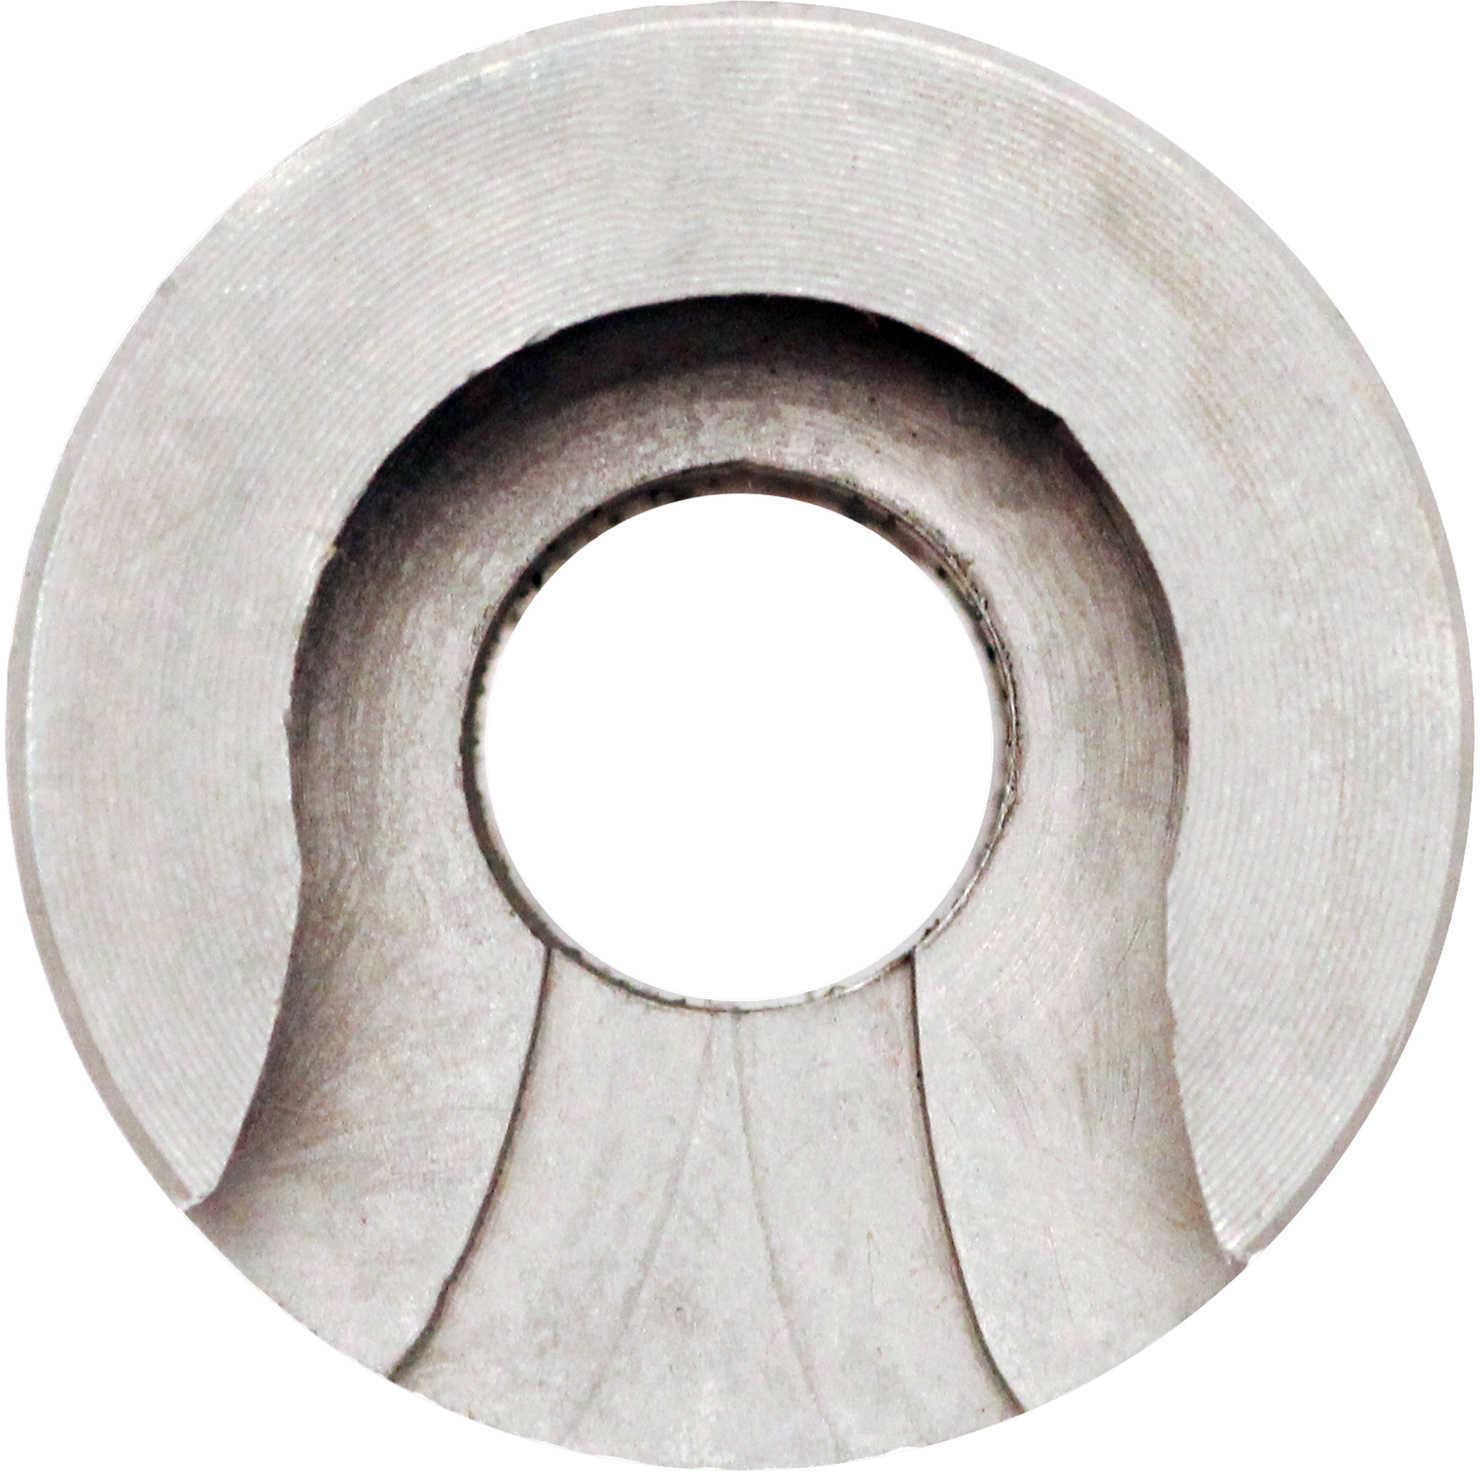 Hornady Shell Holder Size 13 Md: 390553